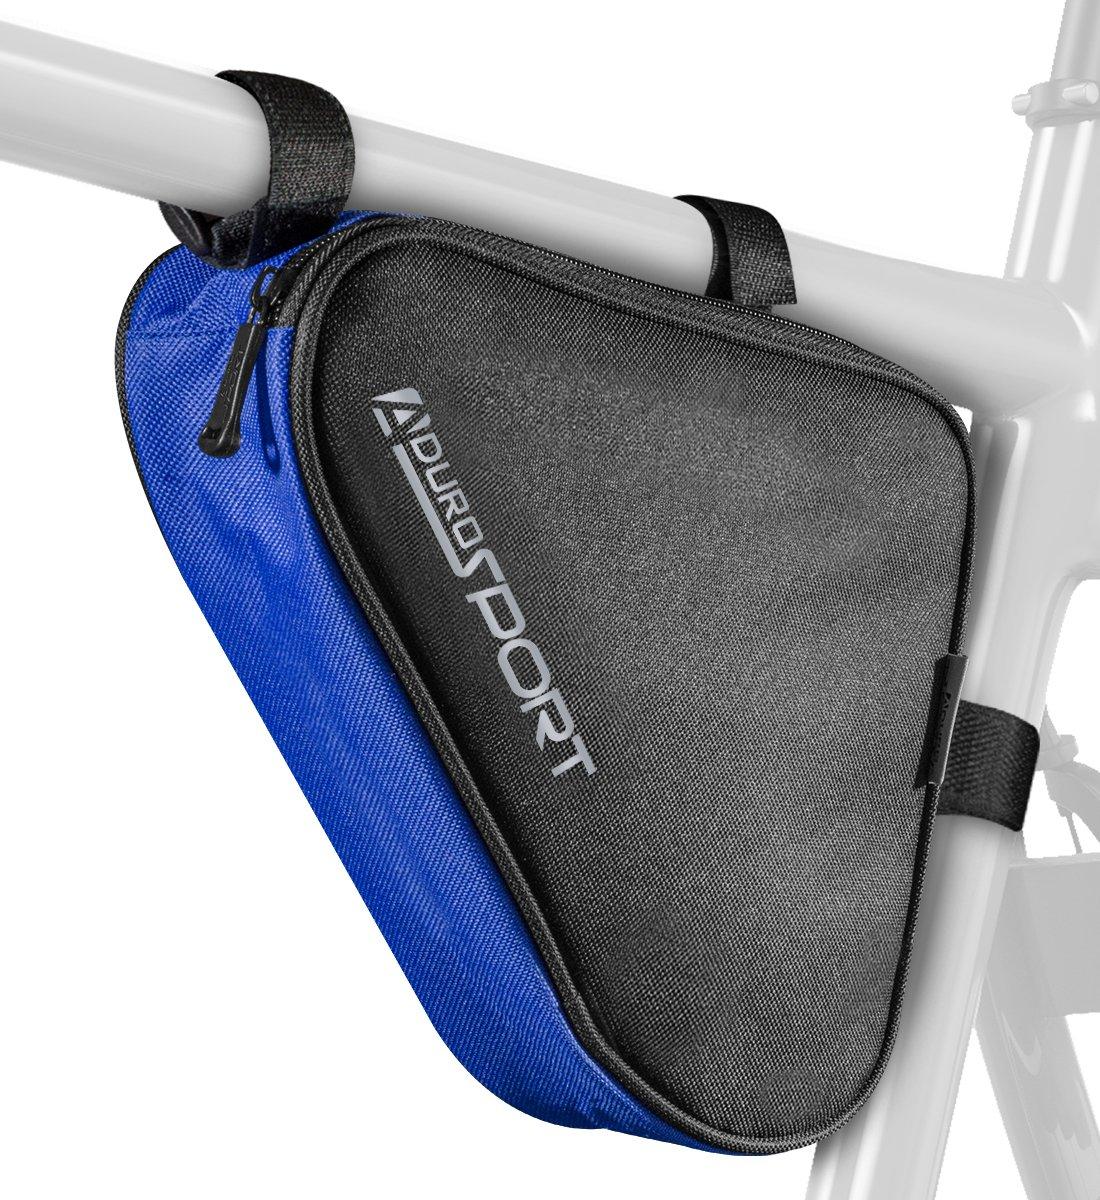 Ibera Bicycle Triangle Frame Bag Sports Outdoors